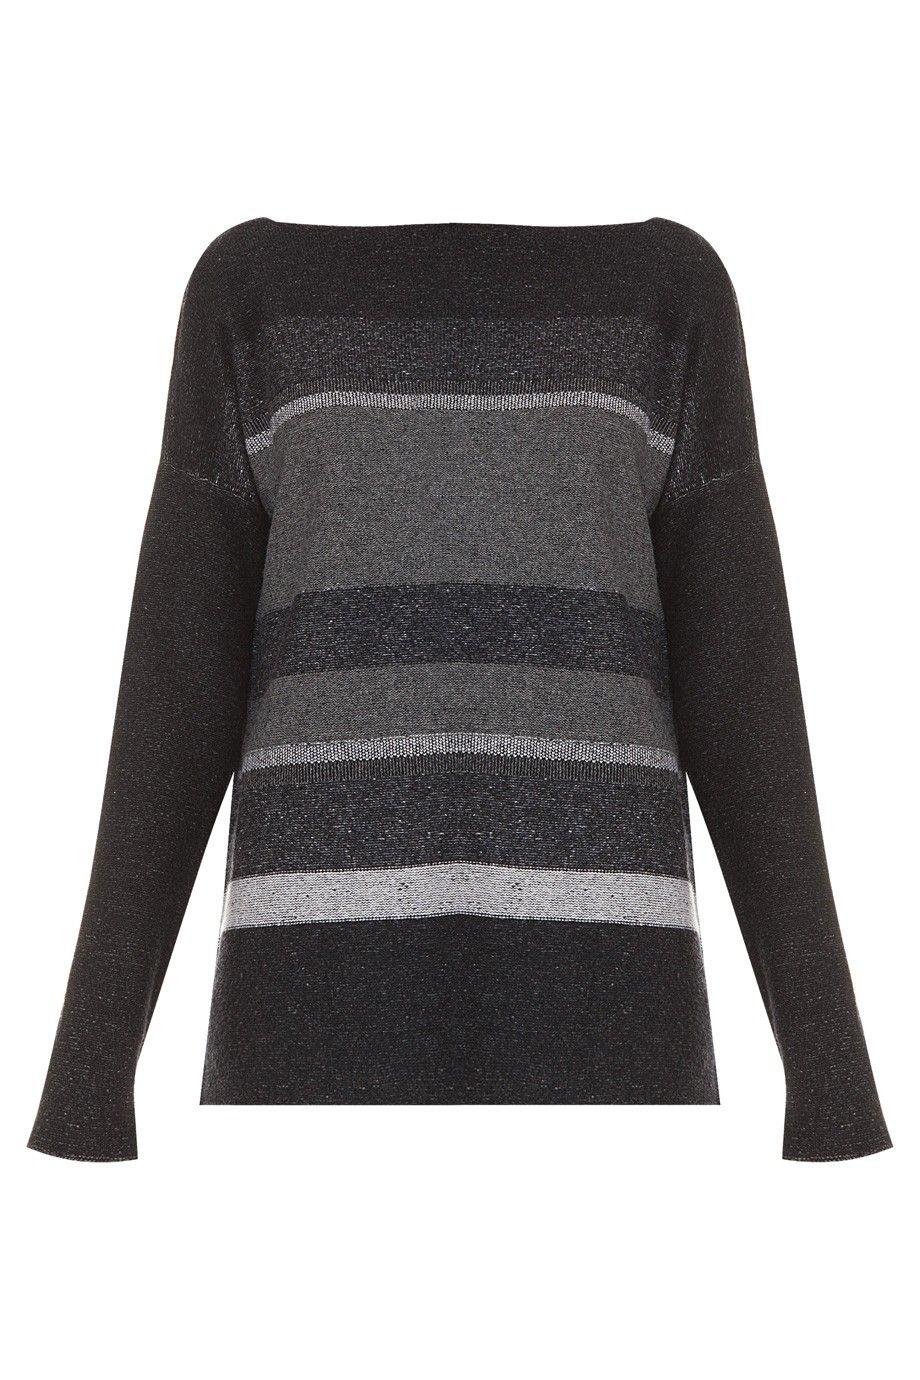 Marl Stripe Jumper By VINCE @ http://www.boutique1.com/